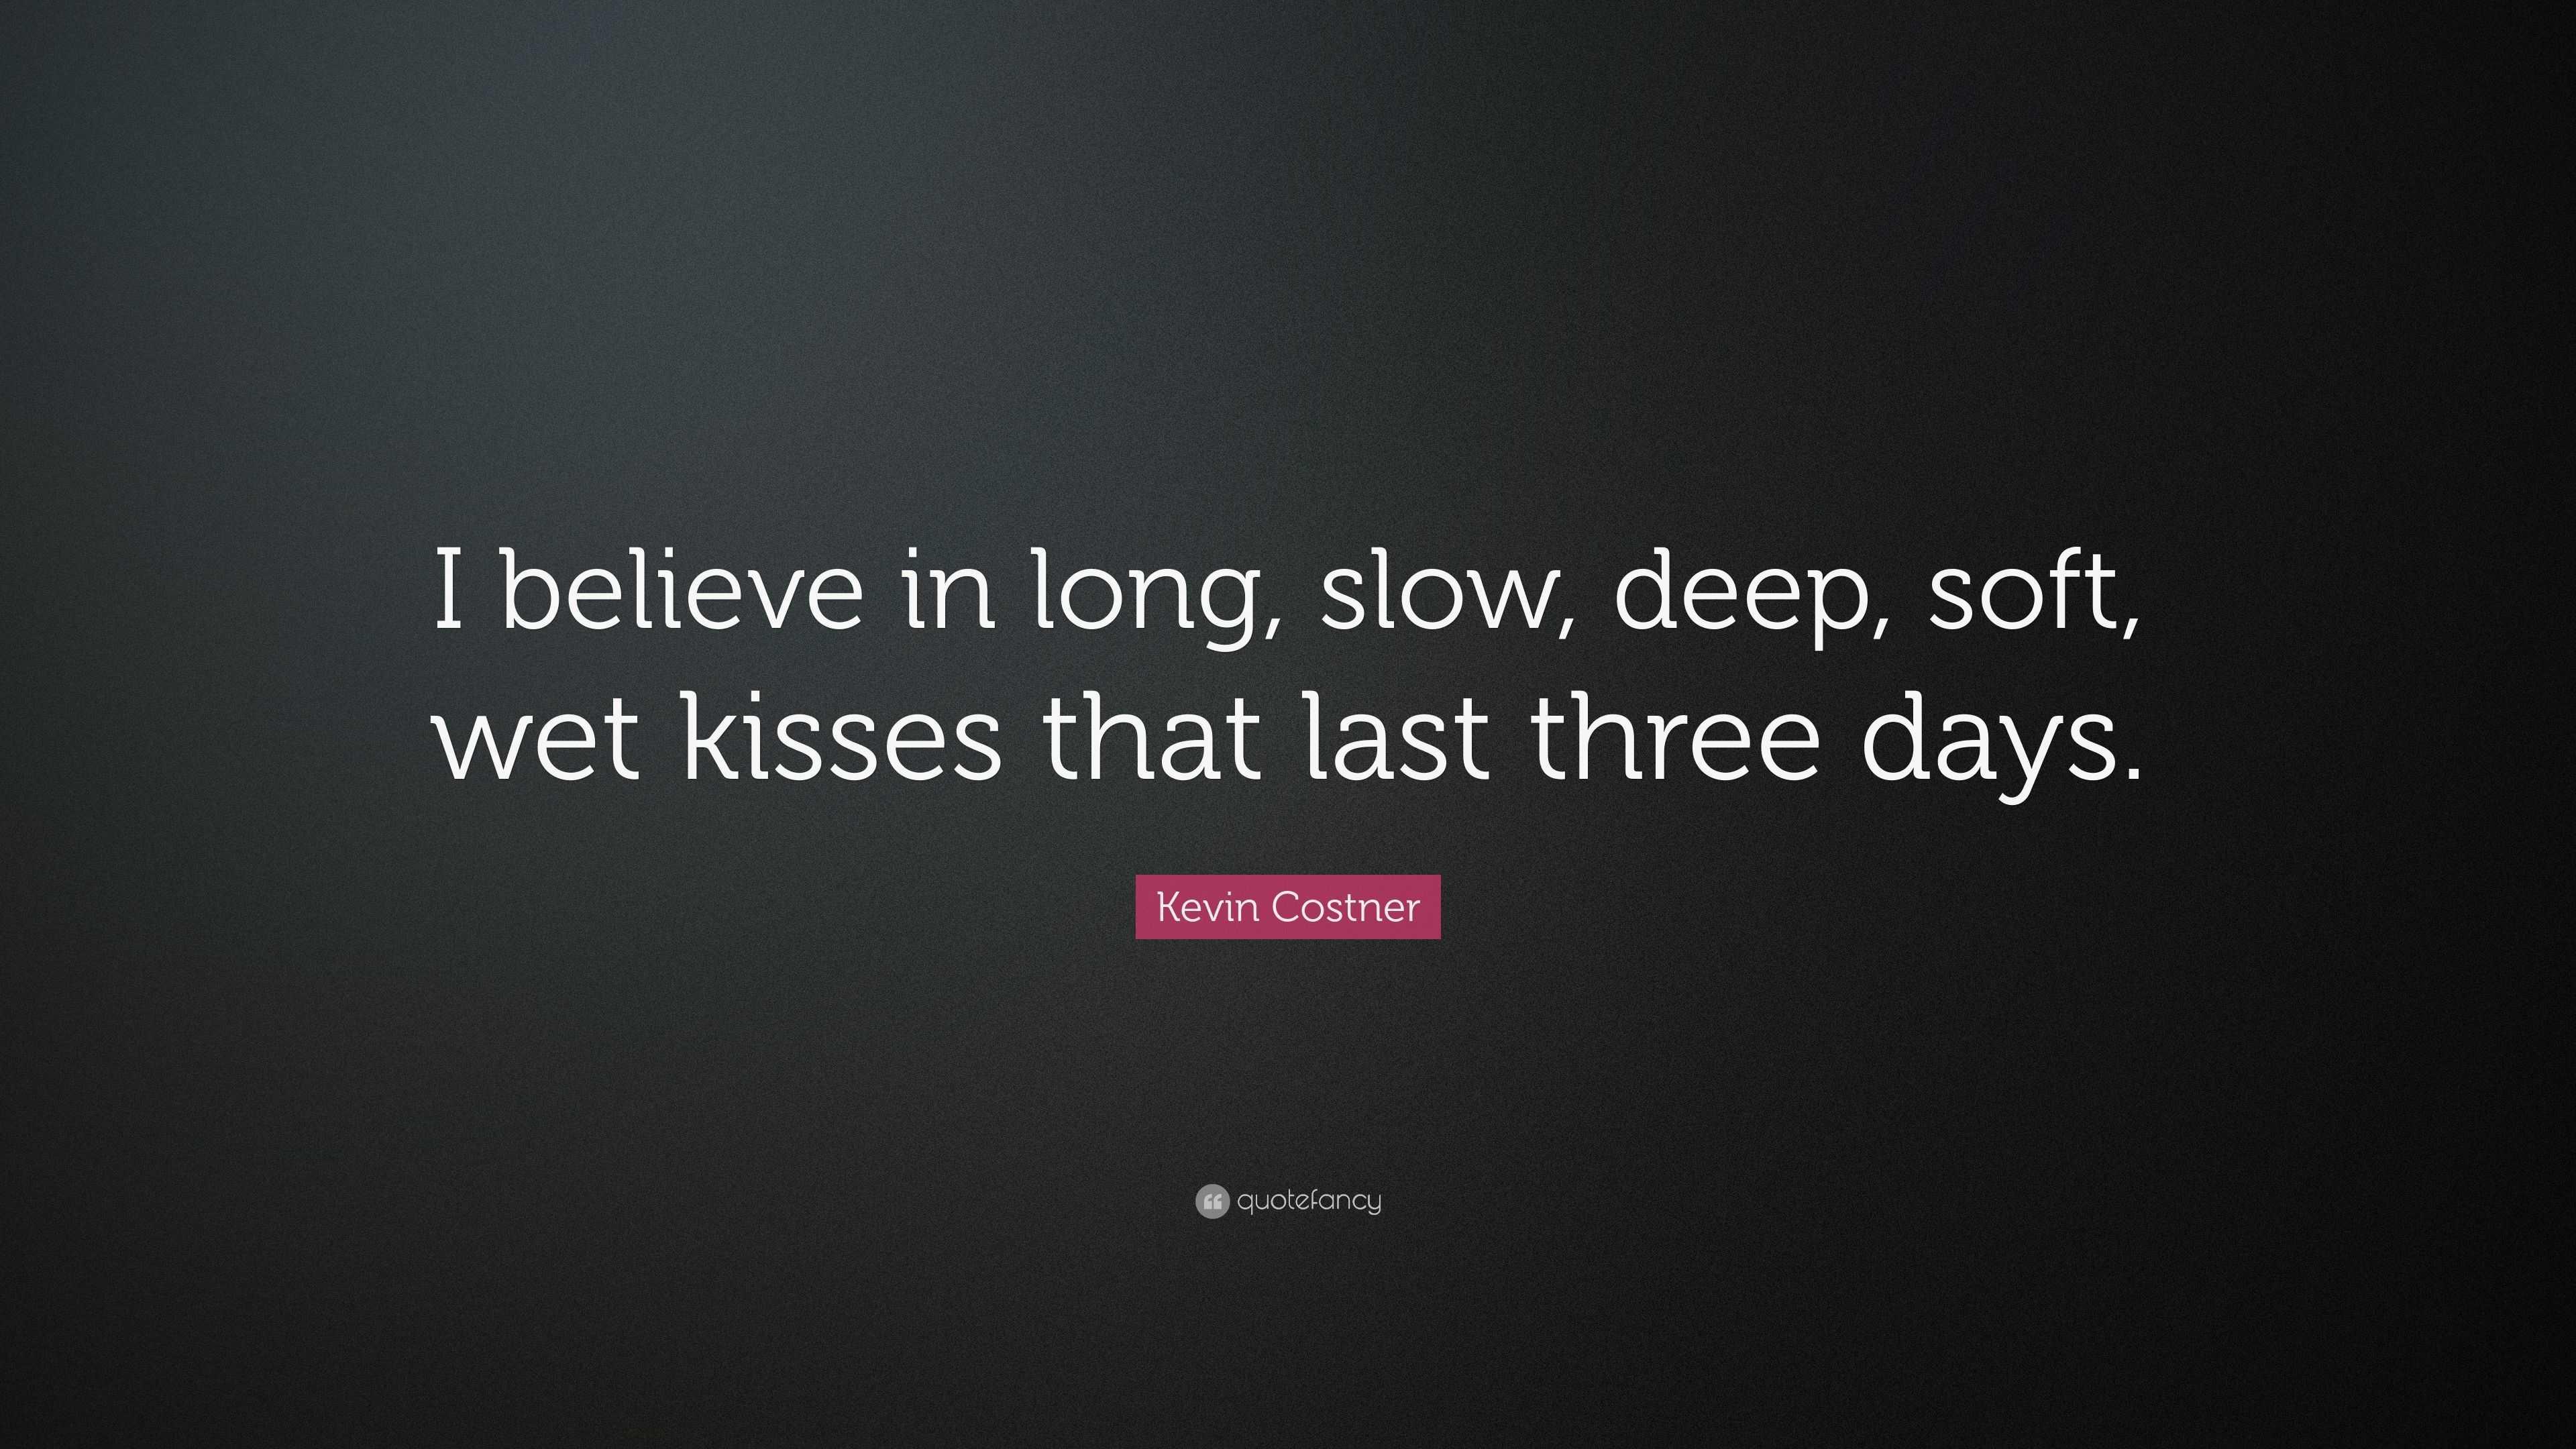 Long slow deep soft wet kisses